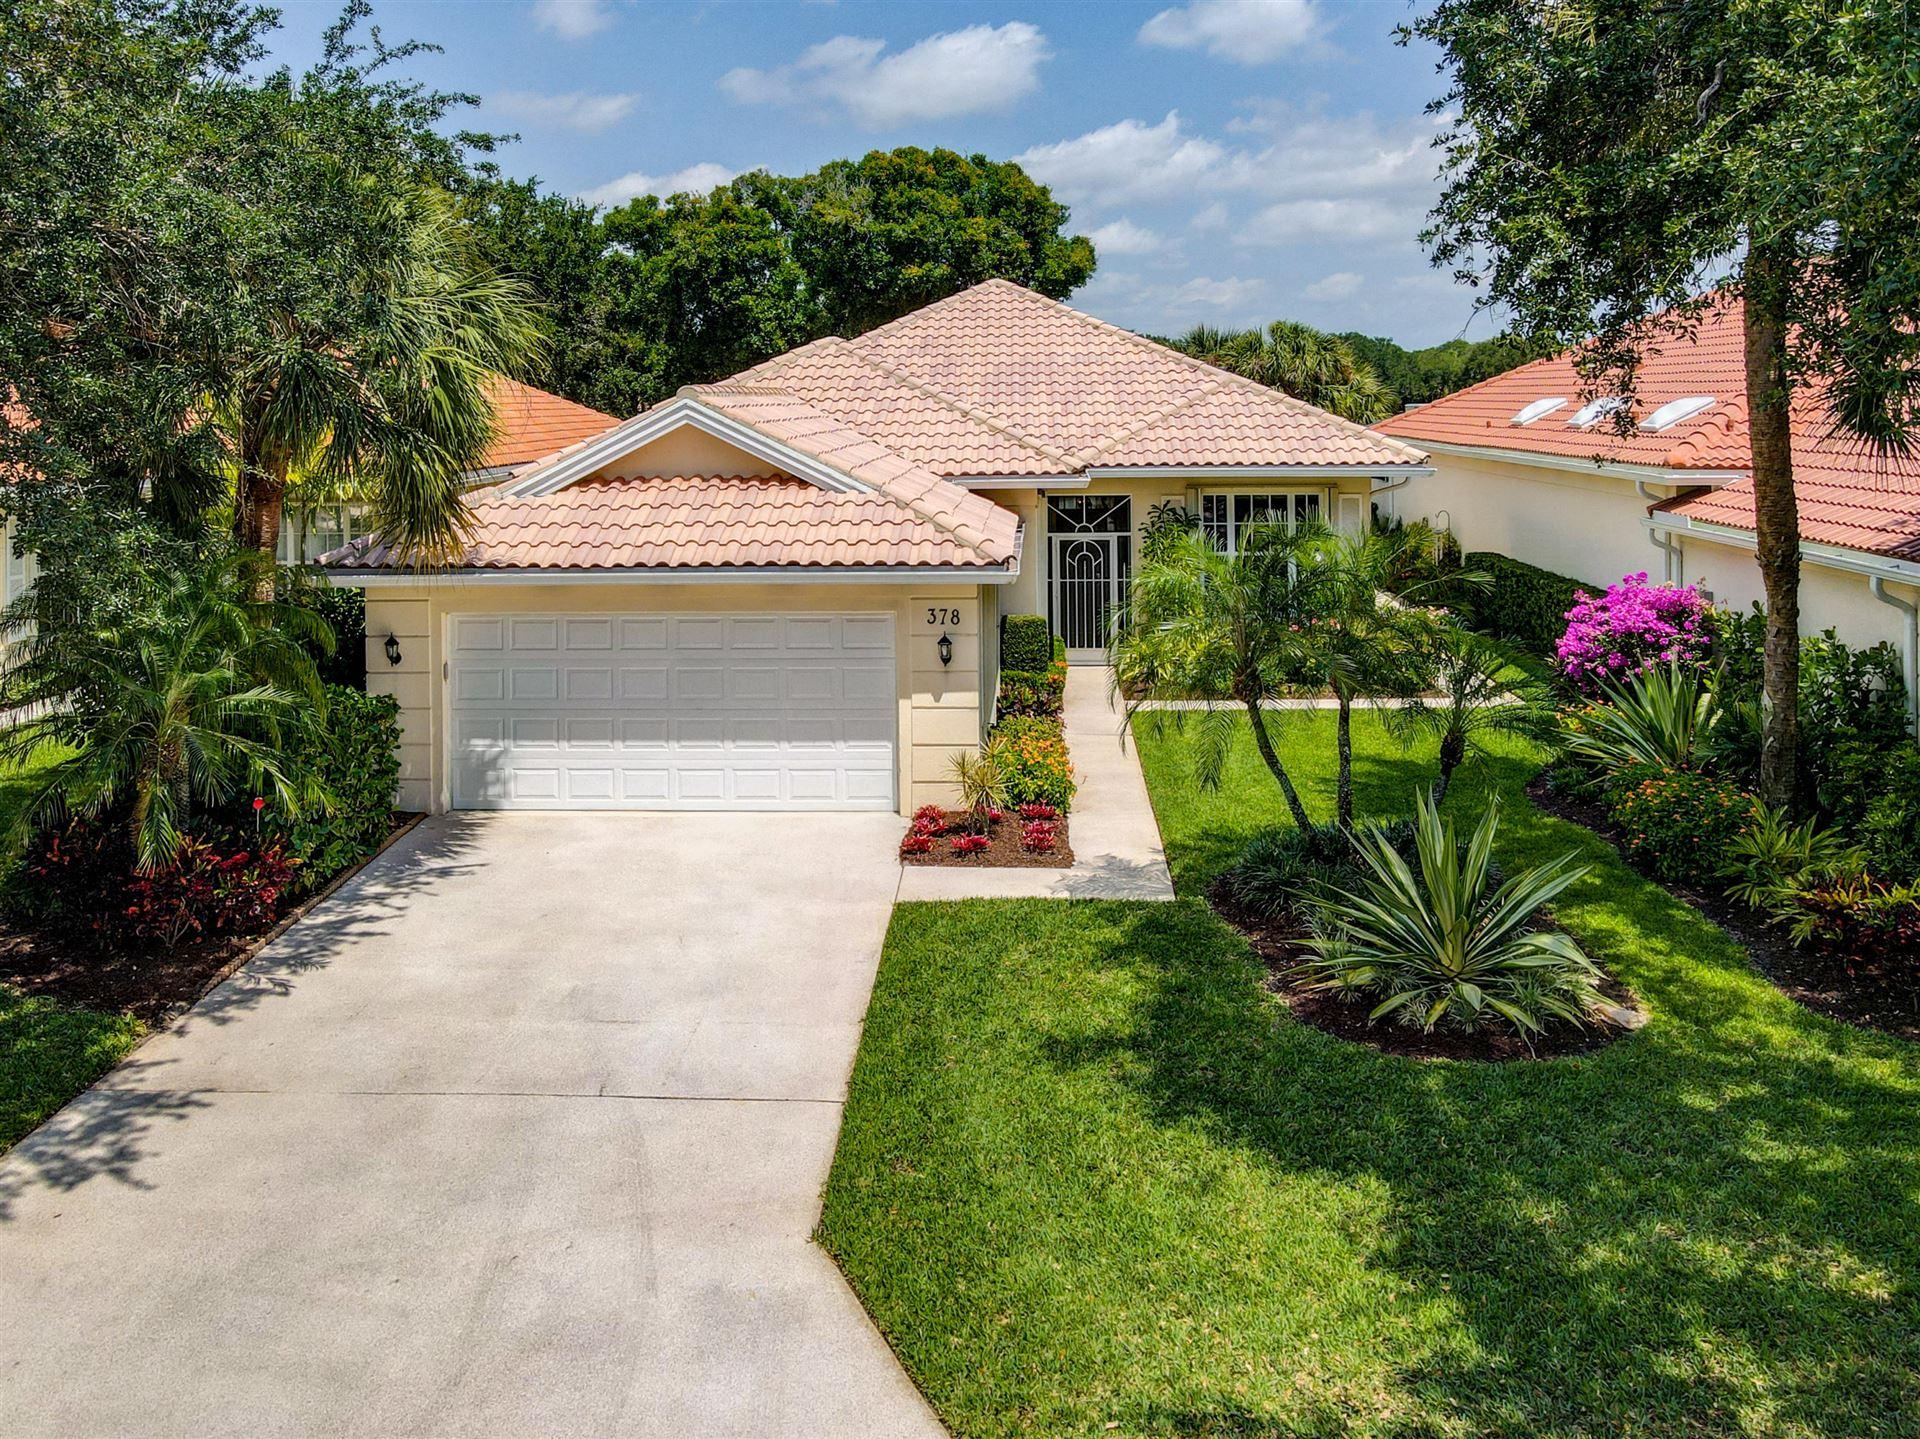 378 Kelsey Park Drive, Palm Beach Gardens, FL 33410 - MLS#: RX-10712646